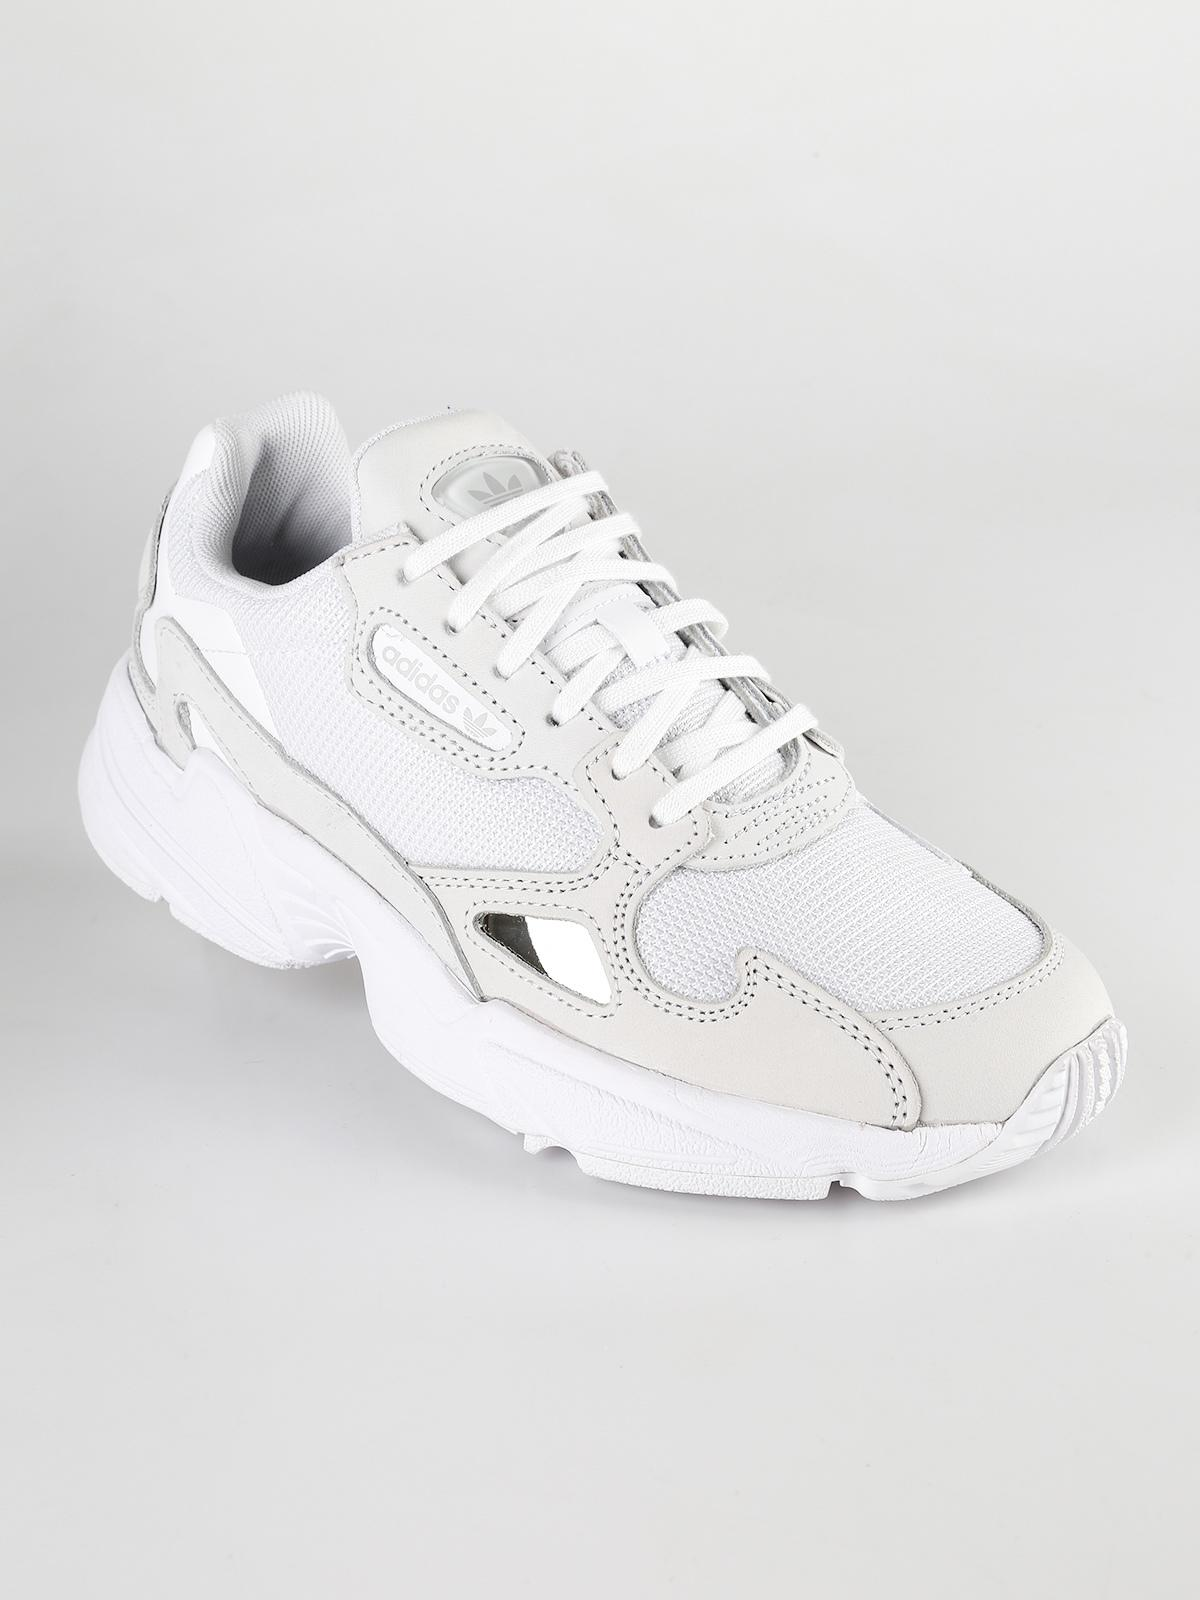 adidas donna scarpe bianche pelle